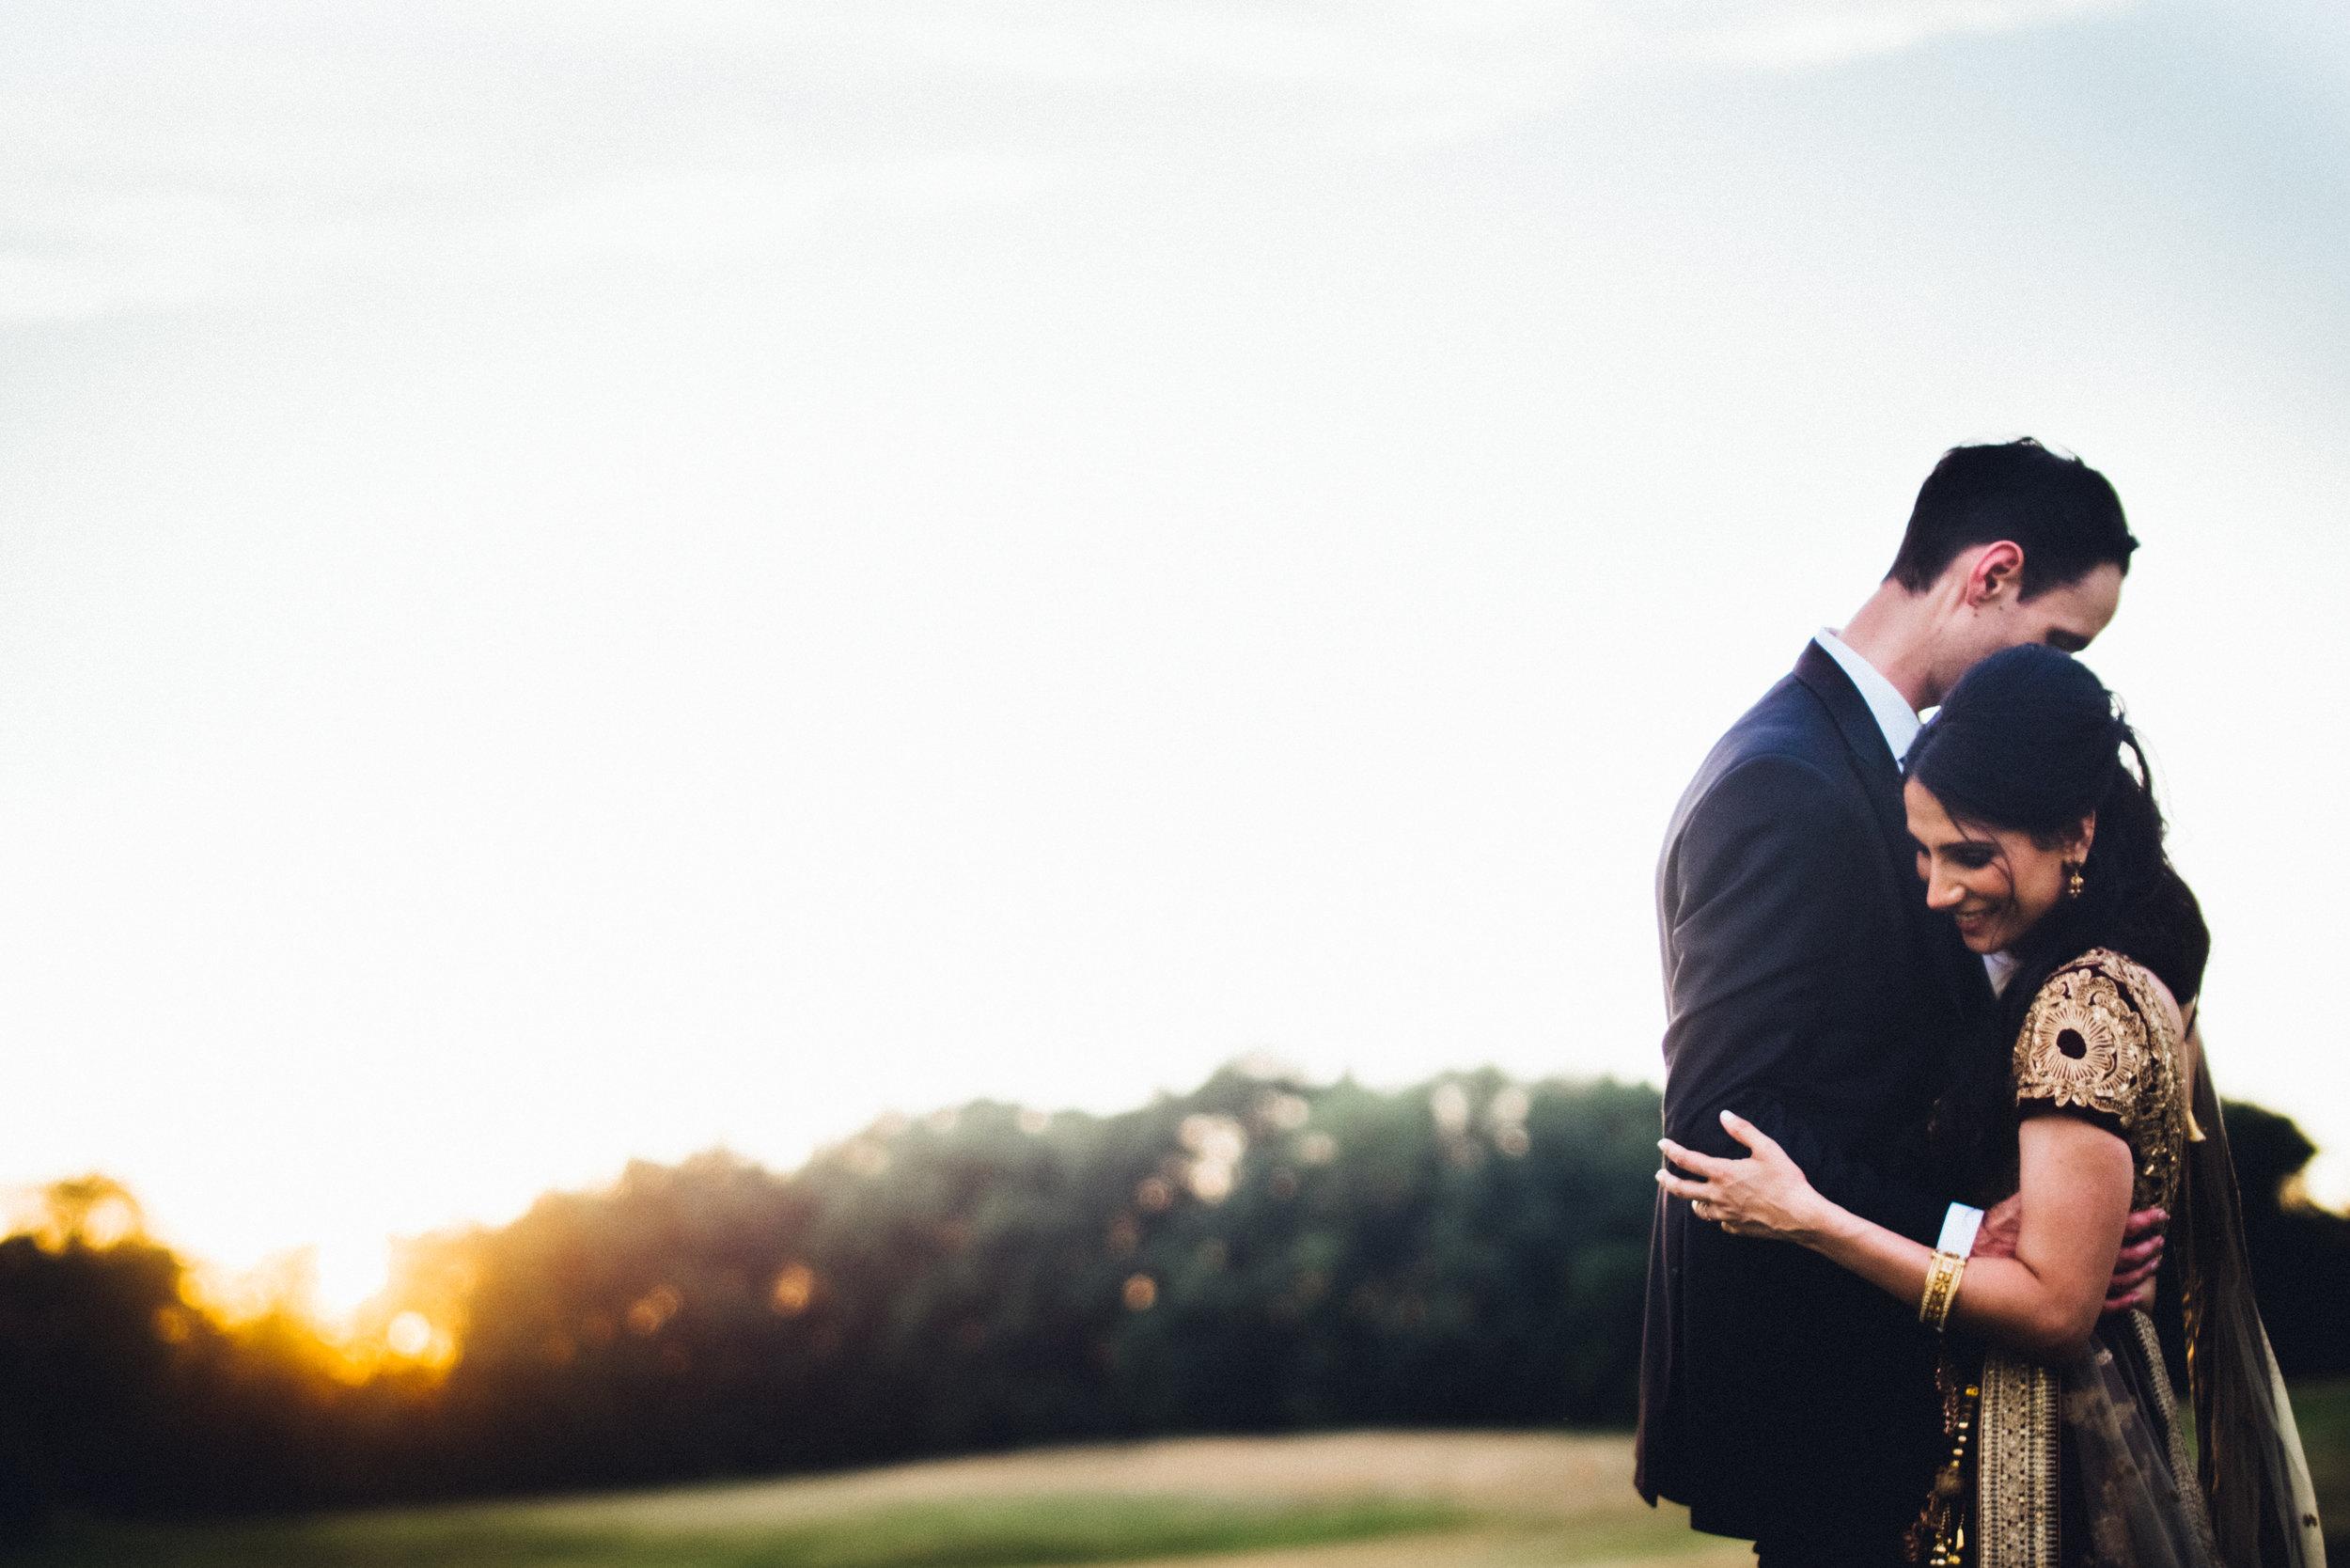 detorit-michigan-wedding-shadow-shine-pictures-photographer-videographer-cinematographer-award-winning-avani-khristoph-becker-bhatt